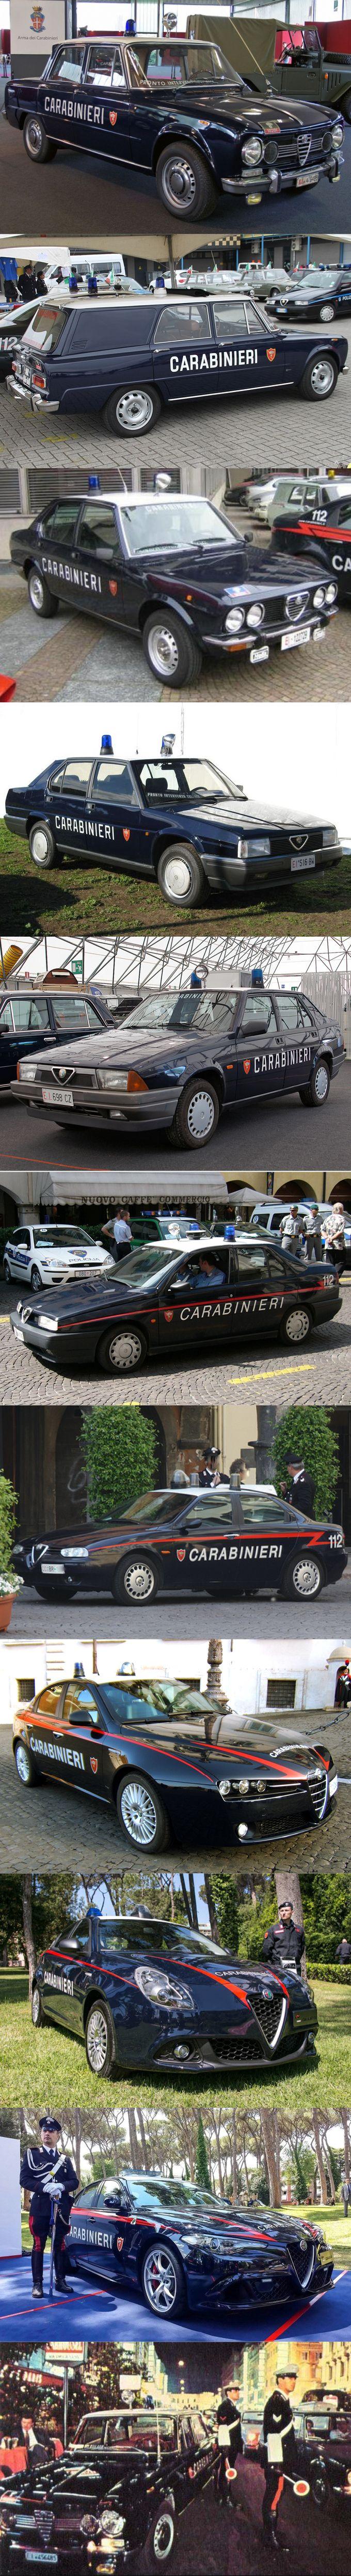 Alfa Romeo Carabinieri / 1962 Giulia / 1972 Alfetta / 1984 90 /1985 75 / 1992 155 / 1997 156 / 2005 159 / 2016 Giulia / Italy / police / blue white red